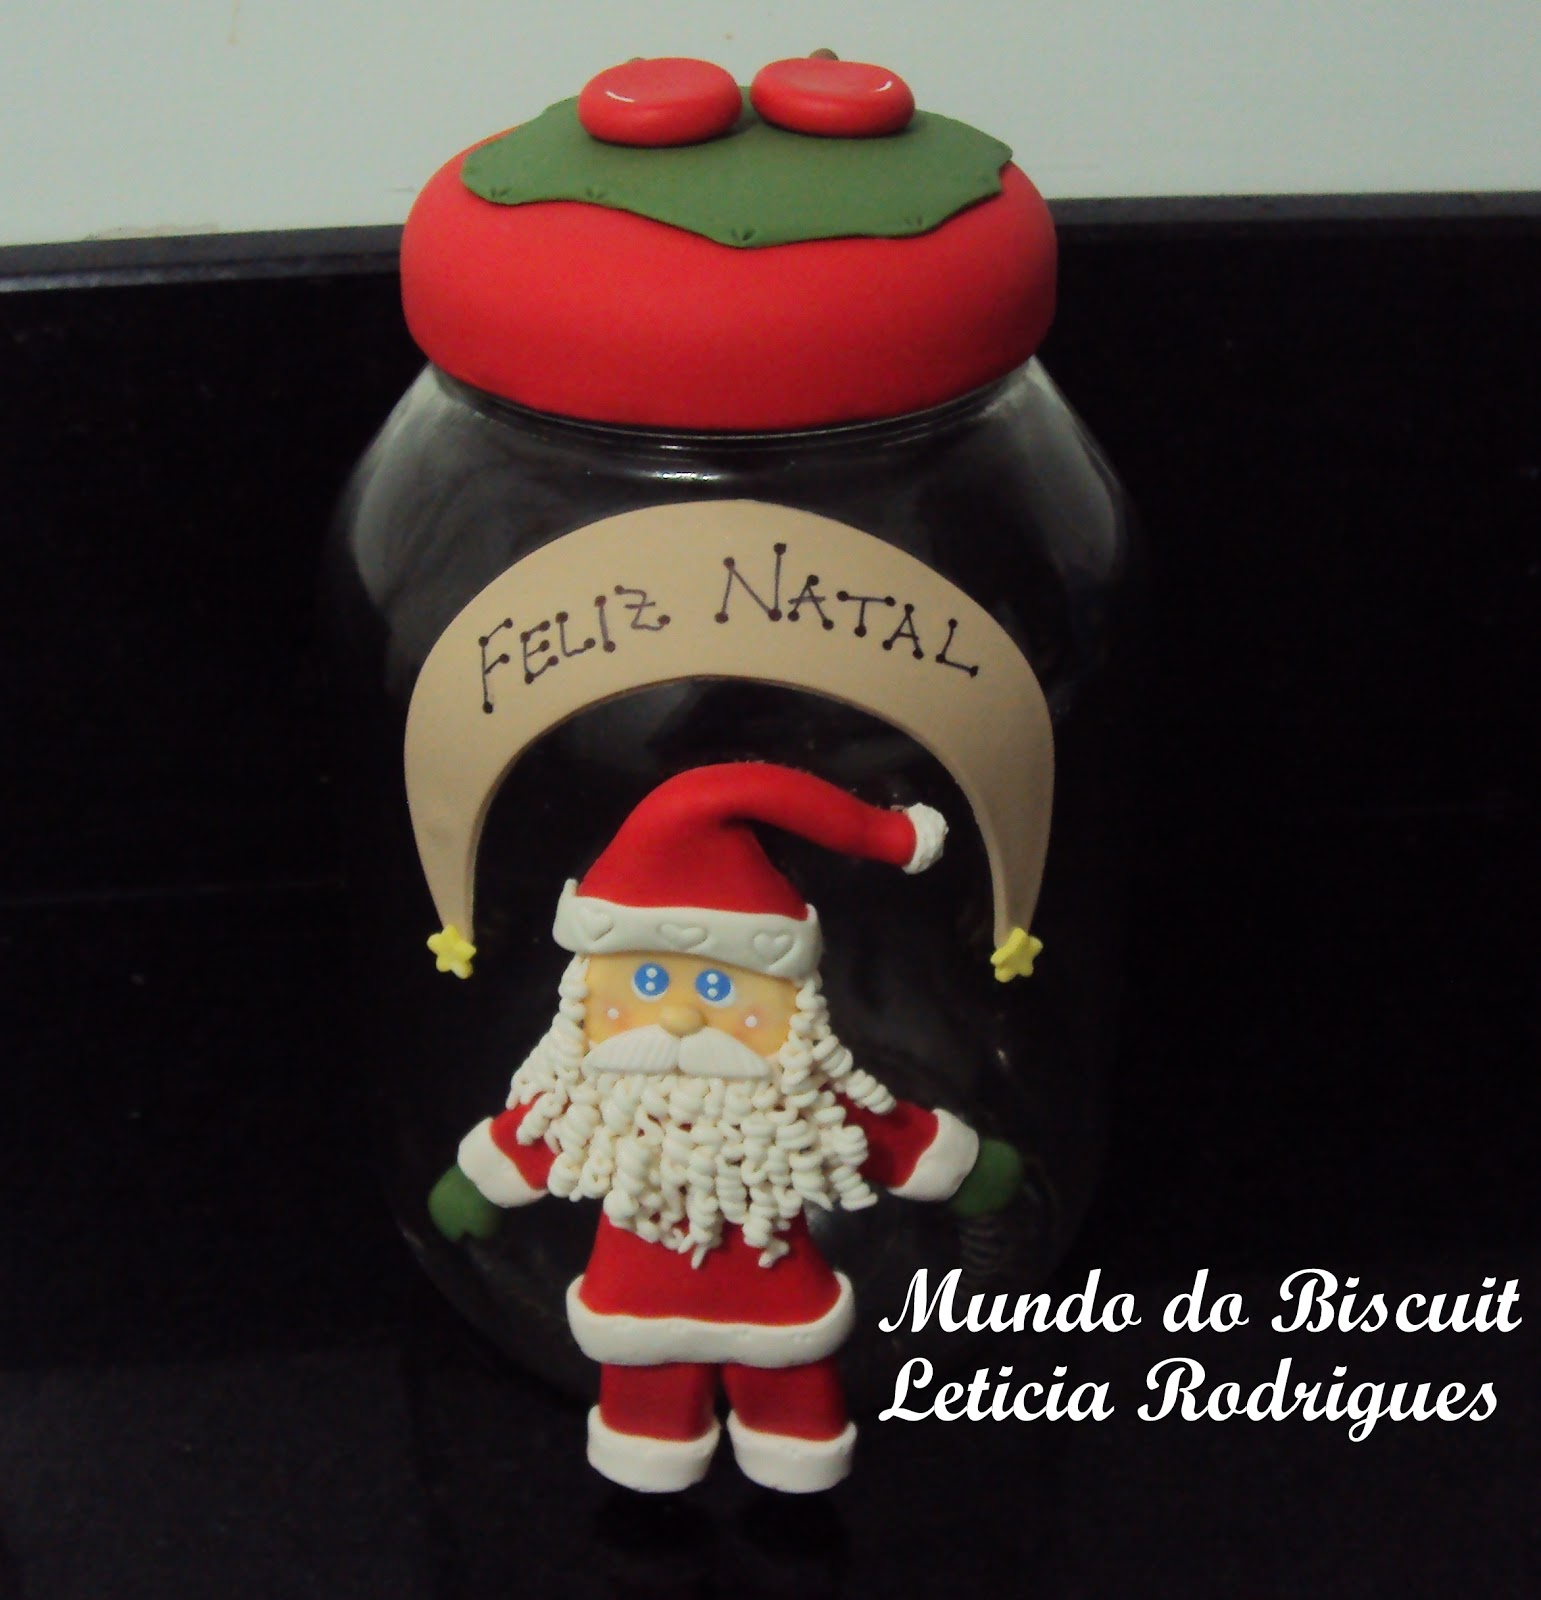 #A82326 Mundo do Biscuit Leticia Rodrigues: Vidro de Natal de Biscuit 194 Janelas De Vidro Natal